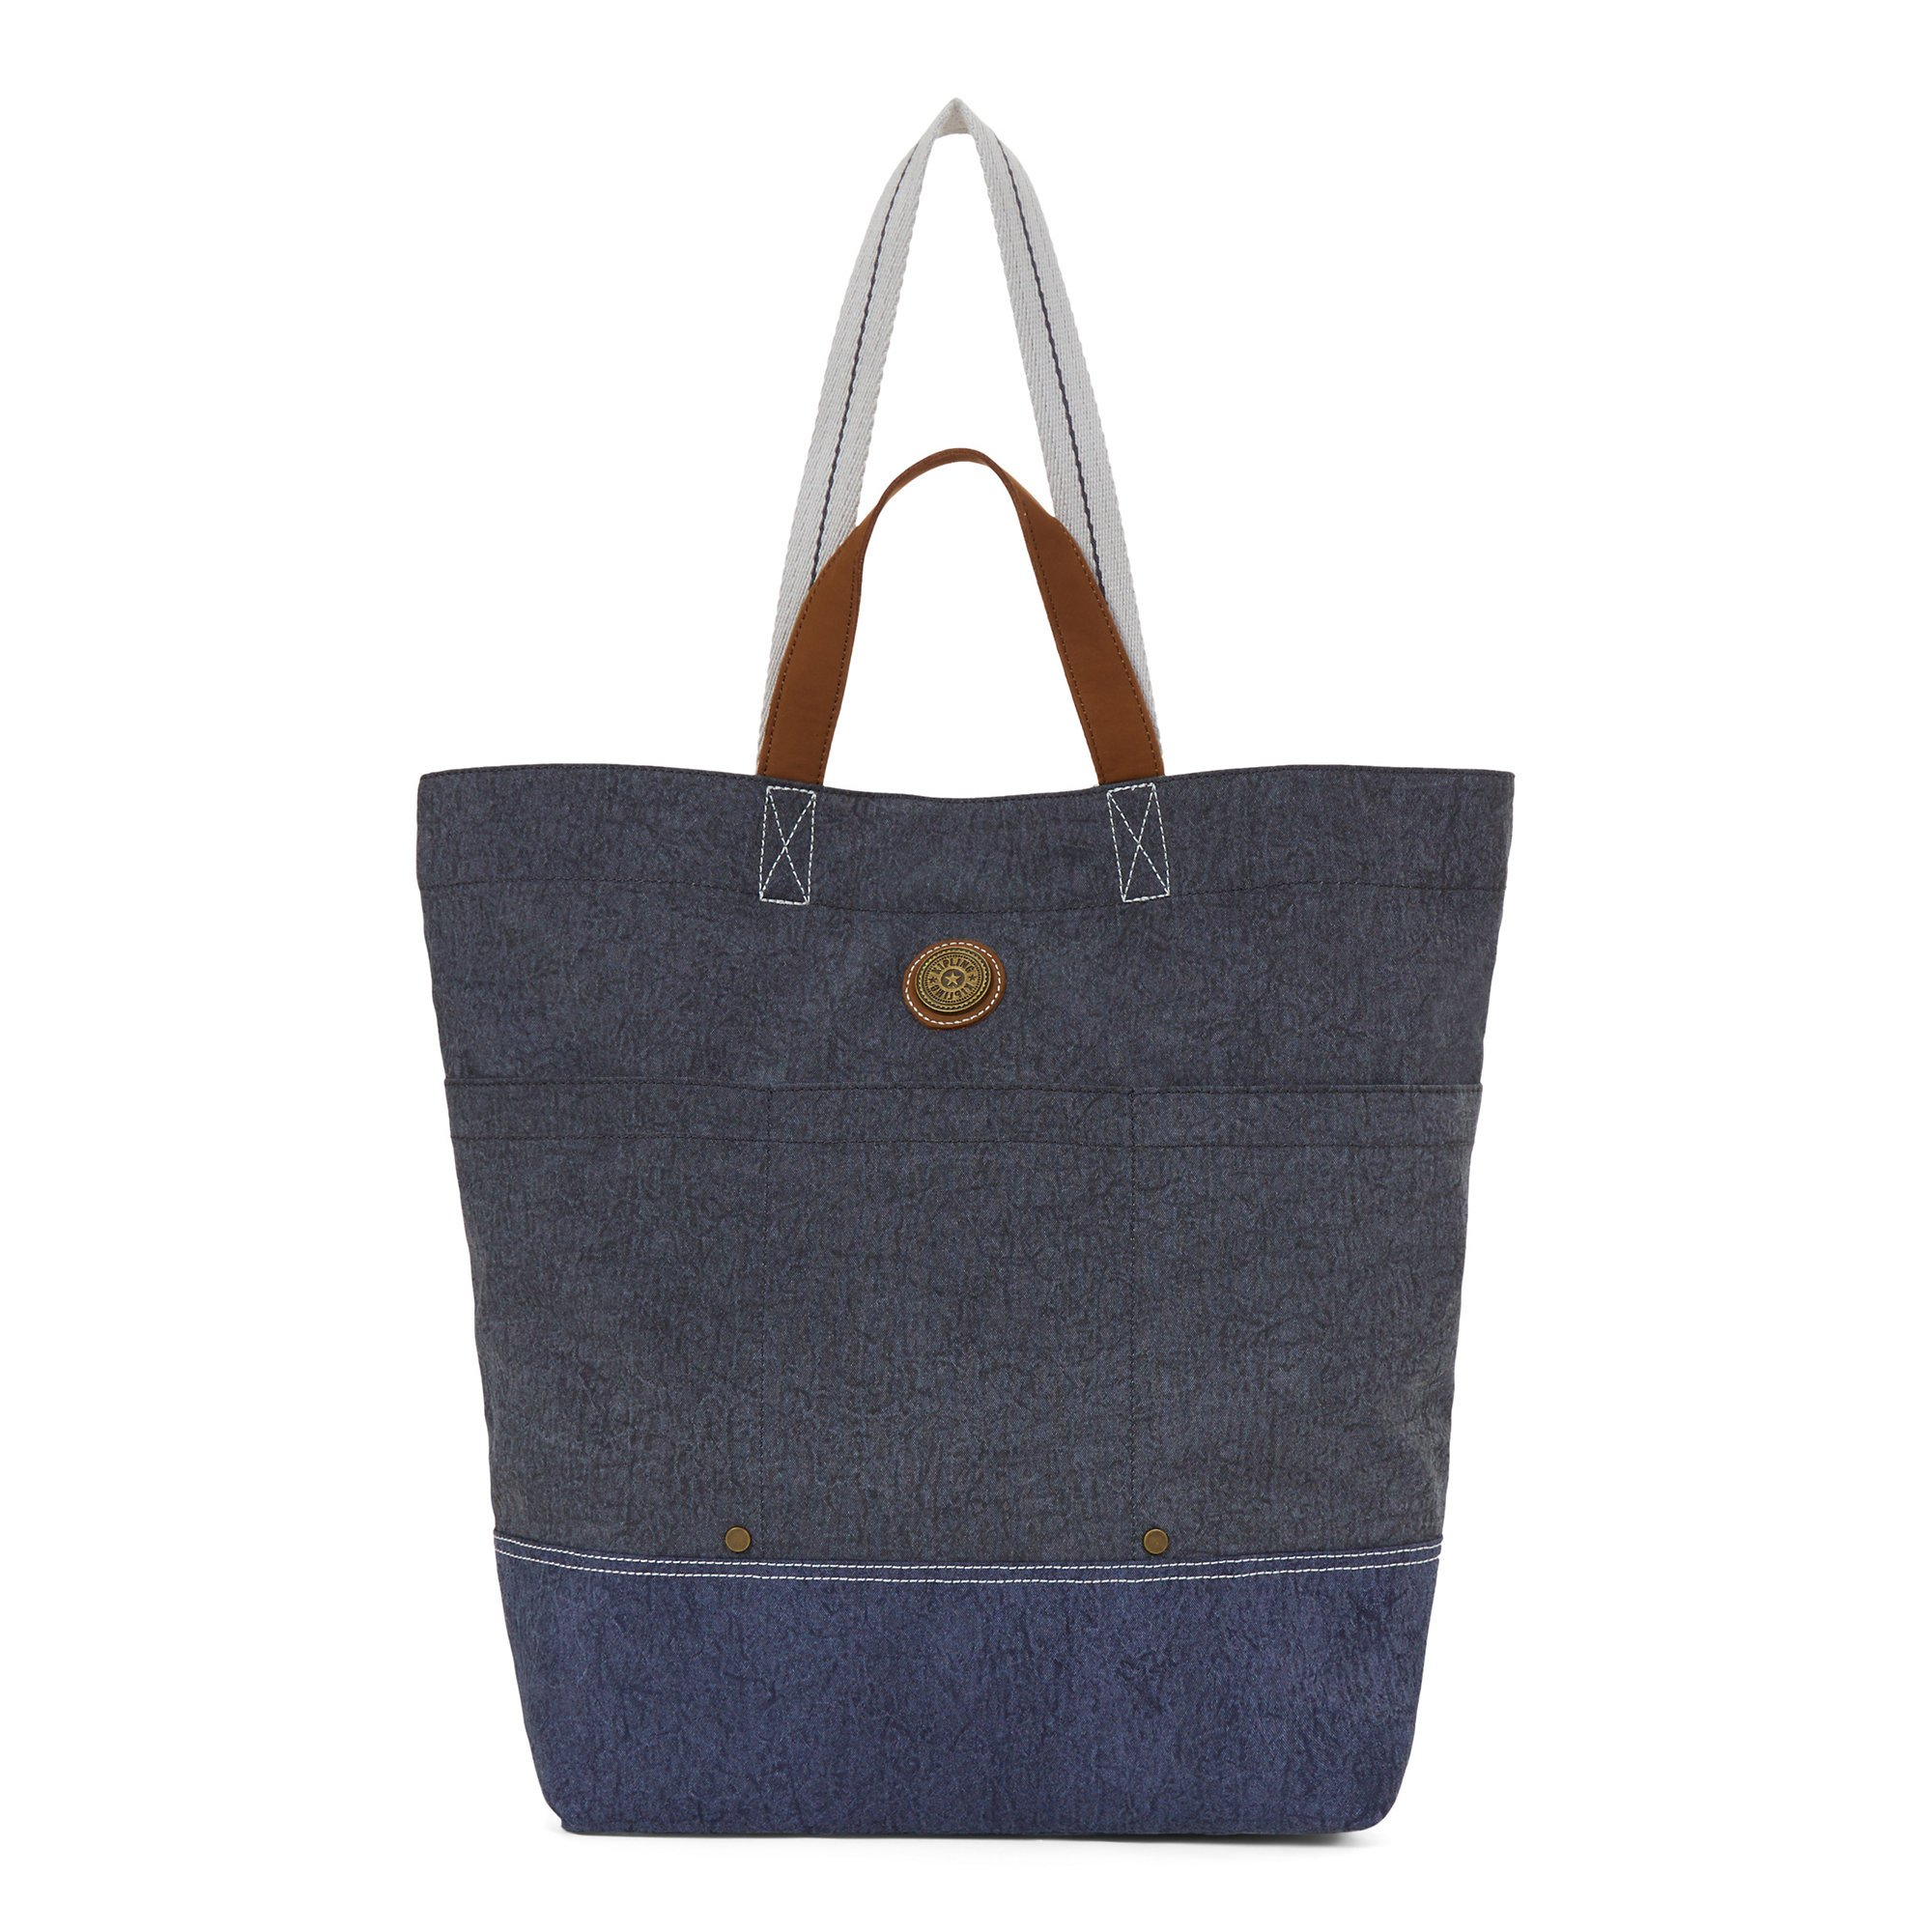 Kipling Women's Hoongry Tote Bag One Size Aged Grey Block by Kipling